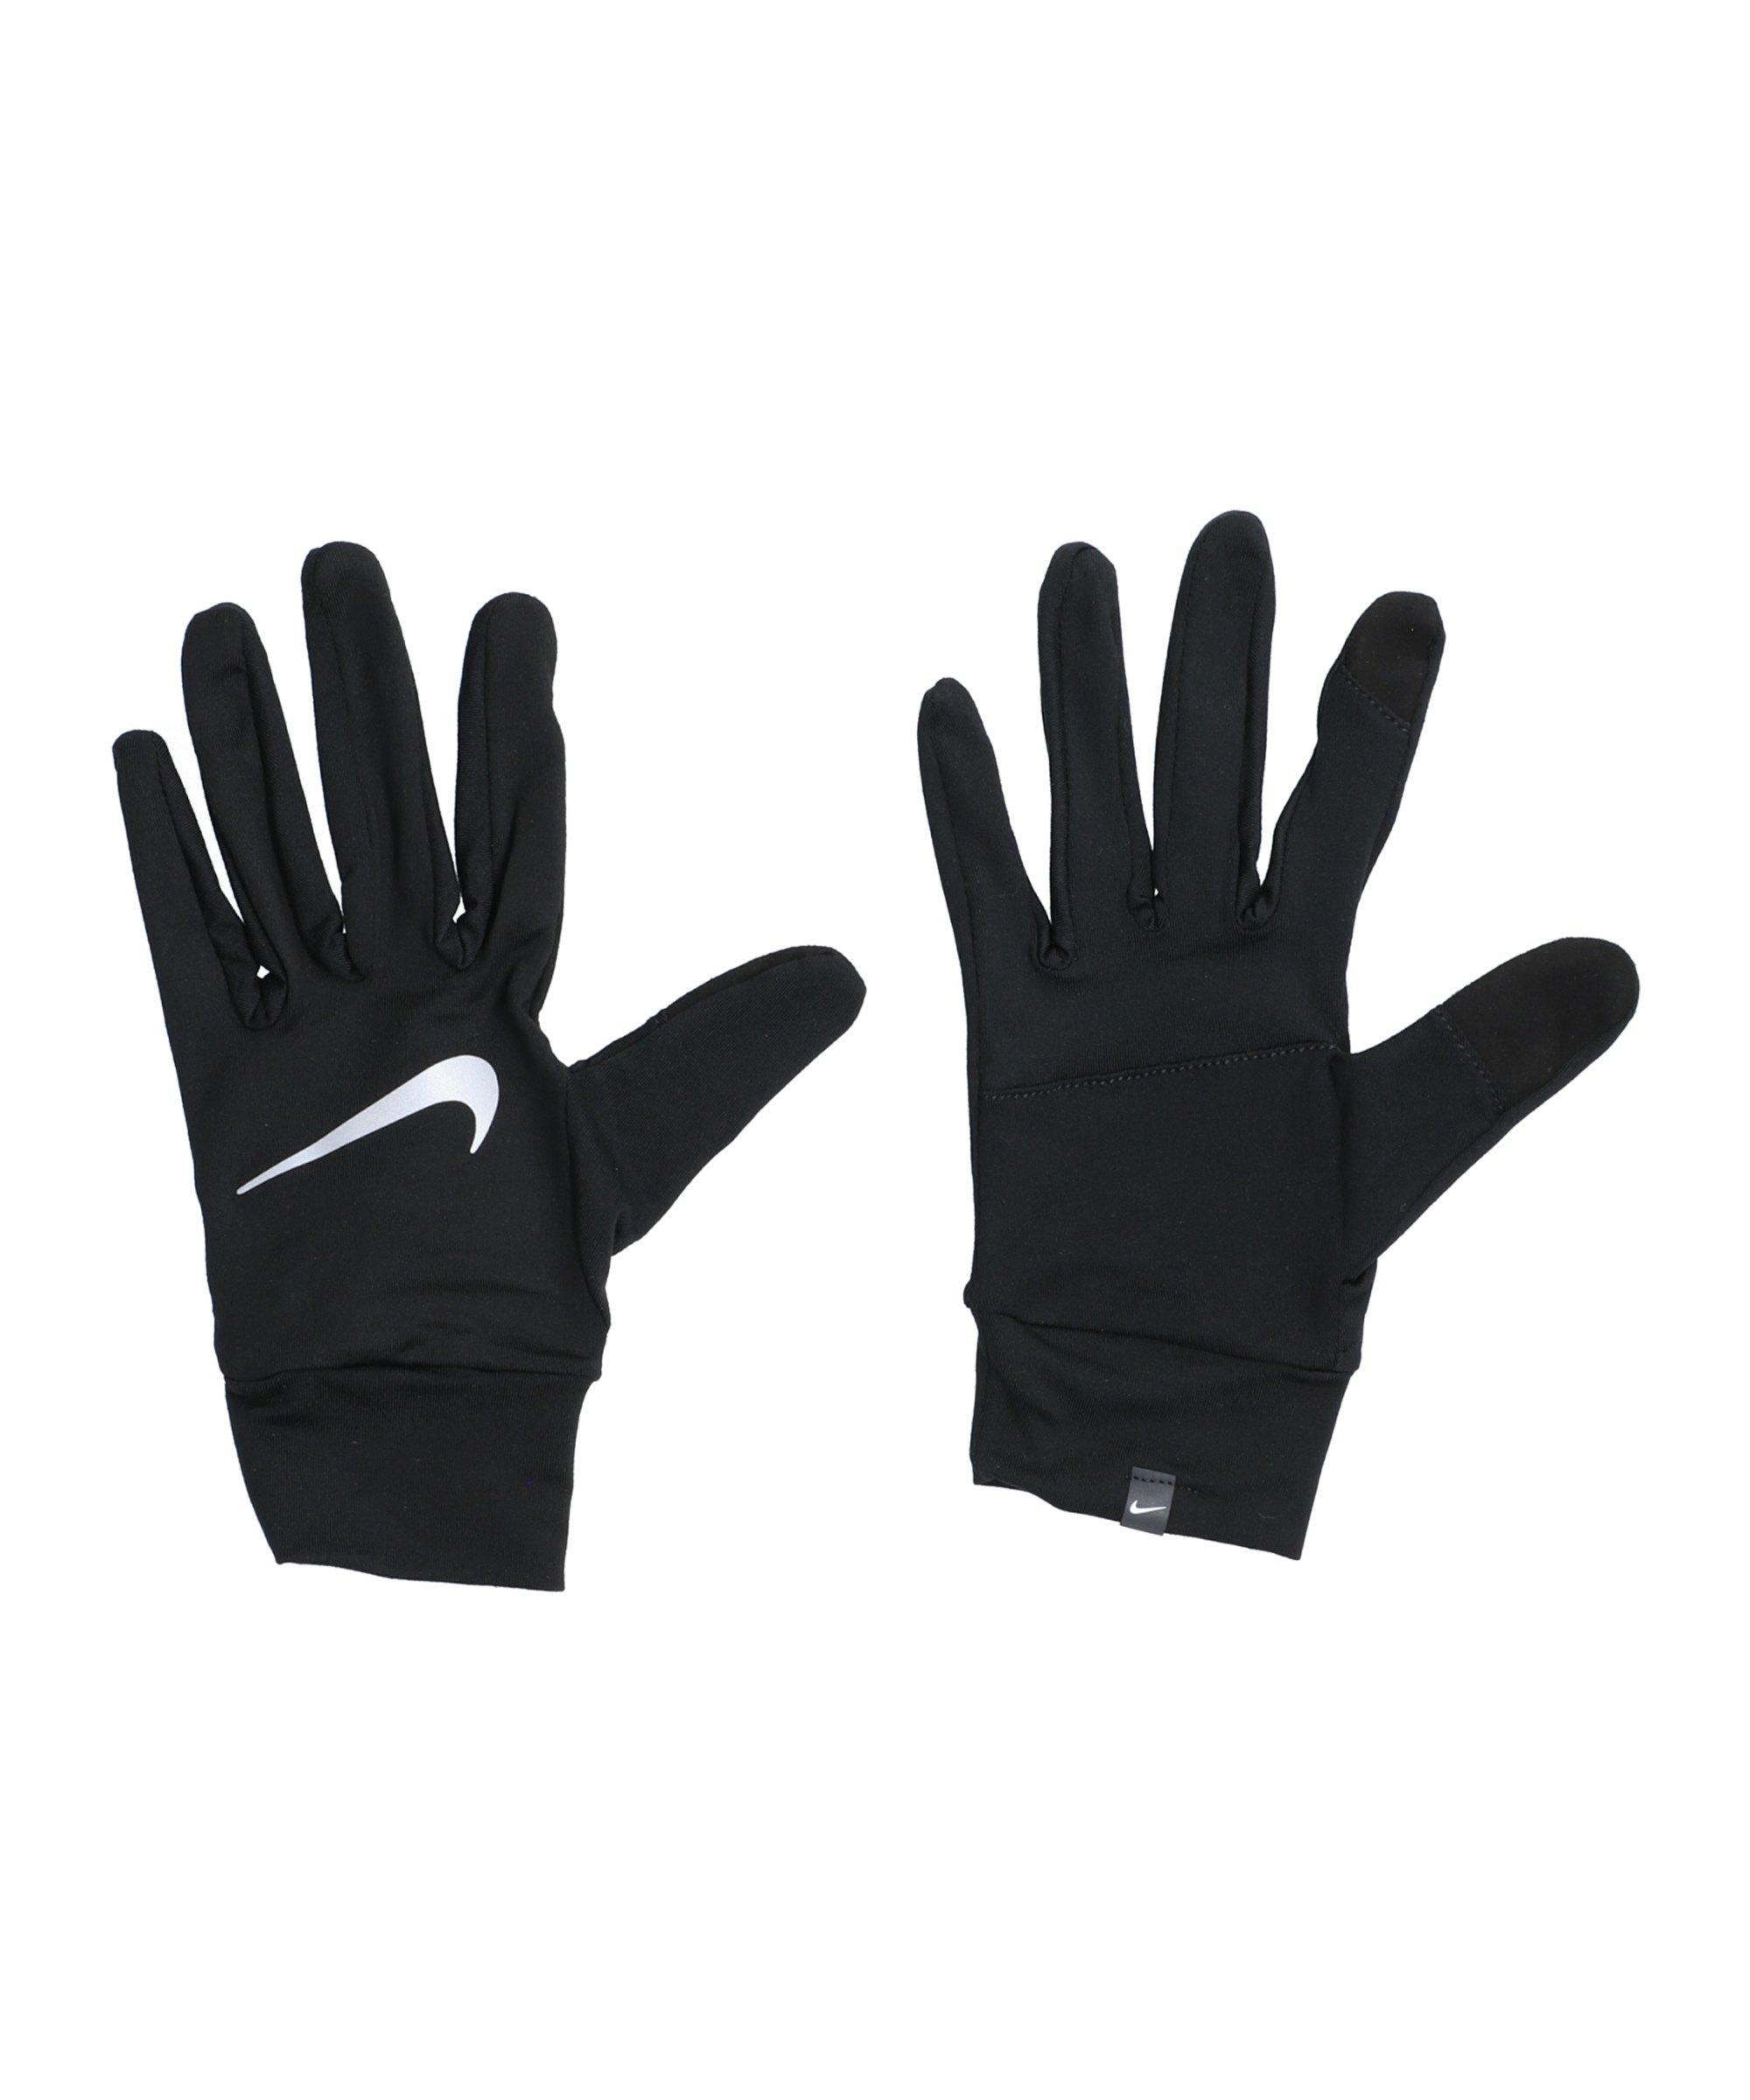 Nike Accelerate Handschuhe Running Schwarz F082 - schwarz